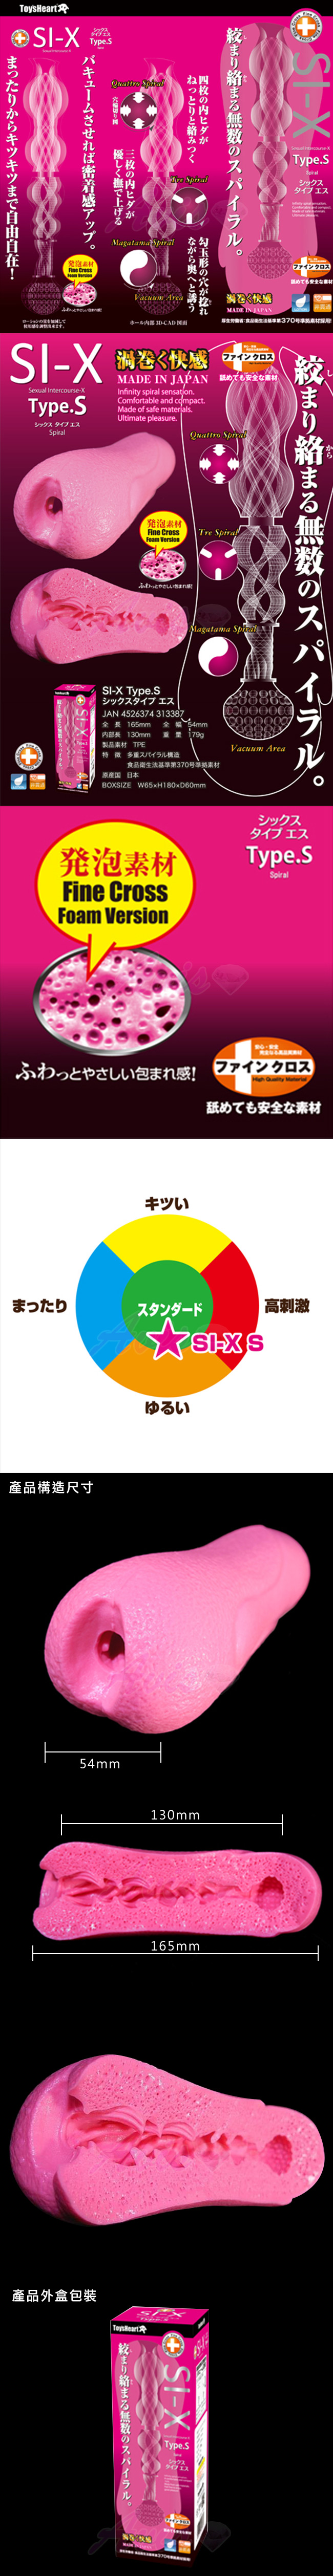 日本對子哈特(Toys Heart) SI-X 深喉嚨緊縮夾吸自慰器 Type.S